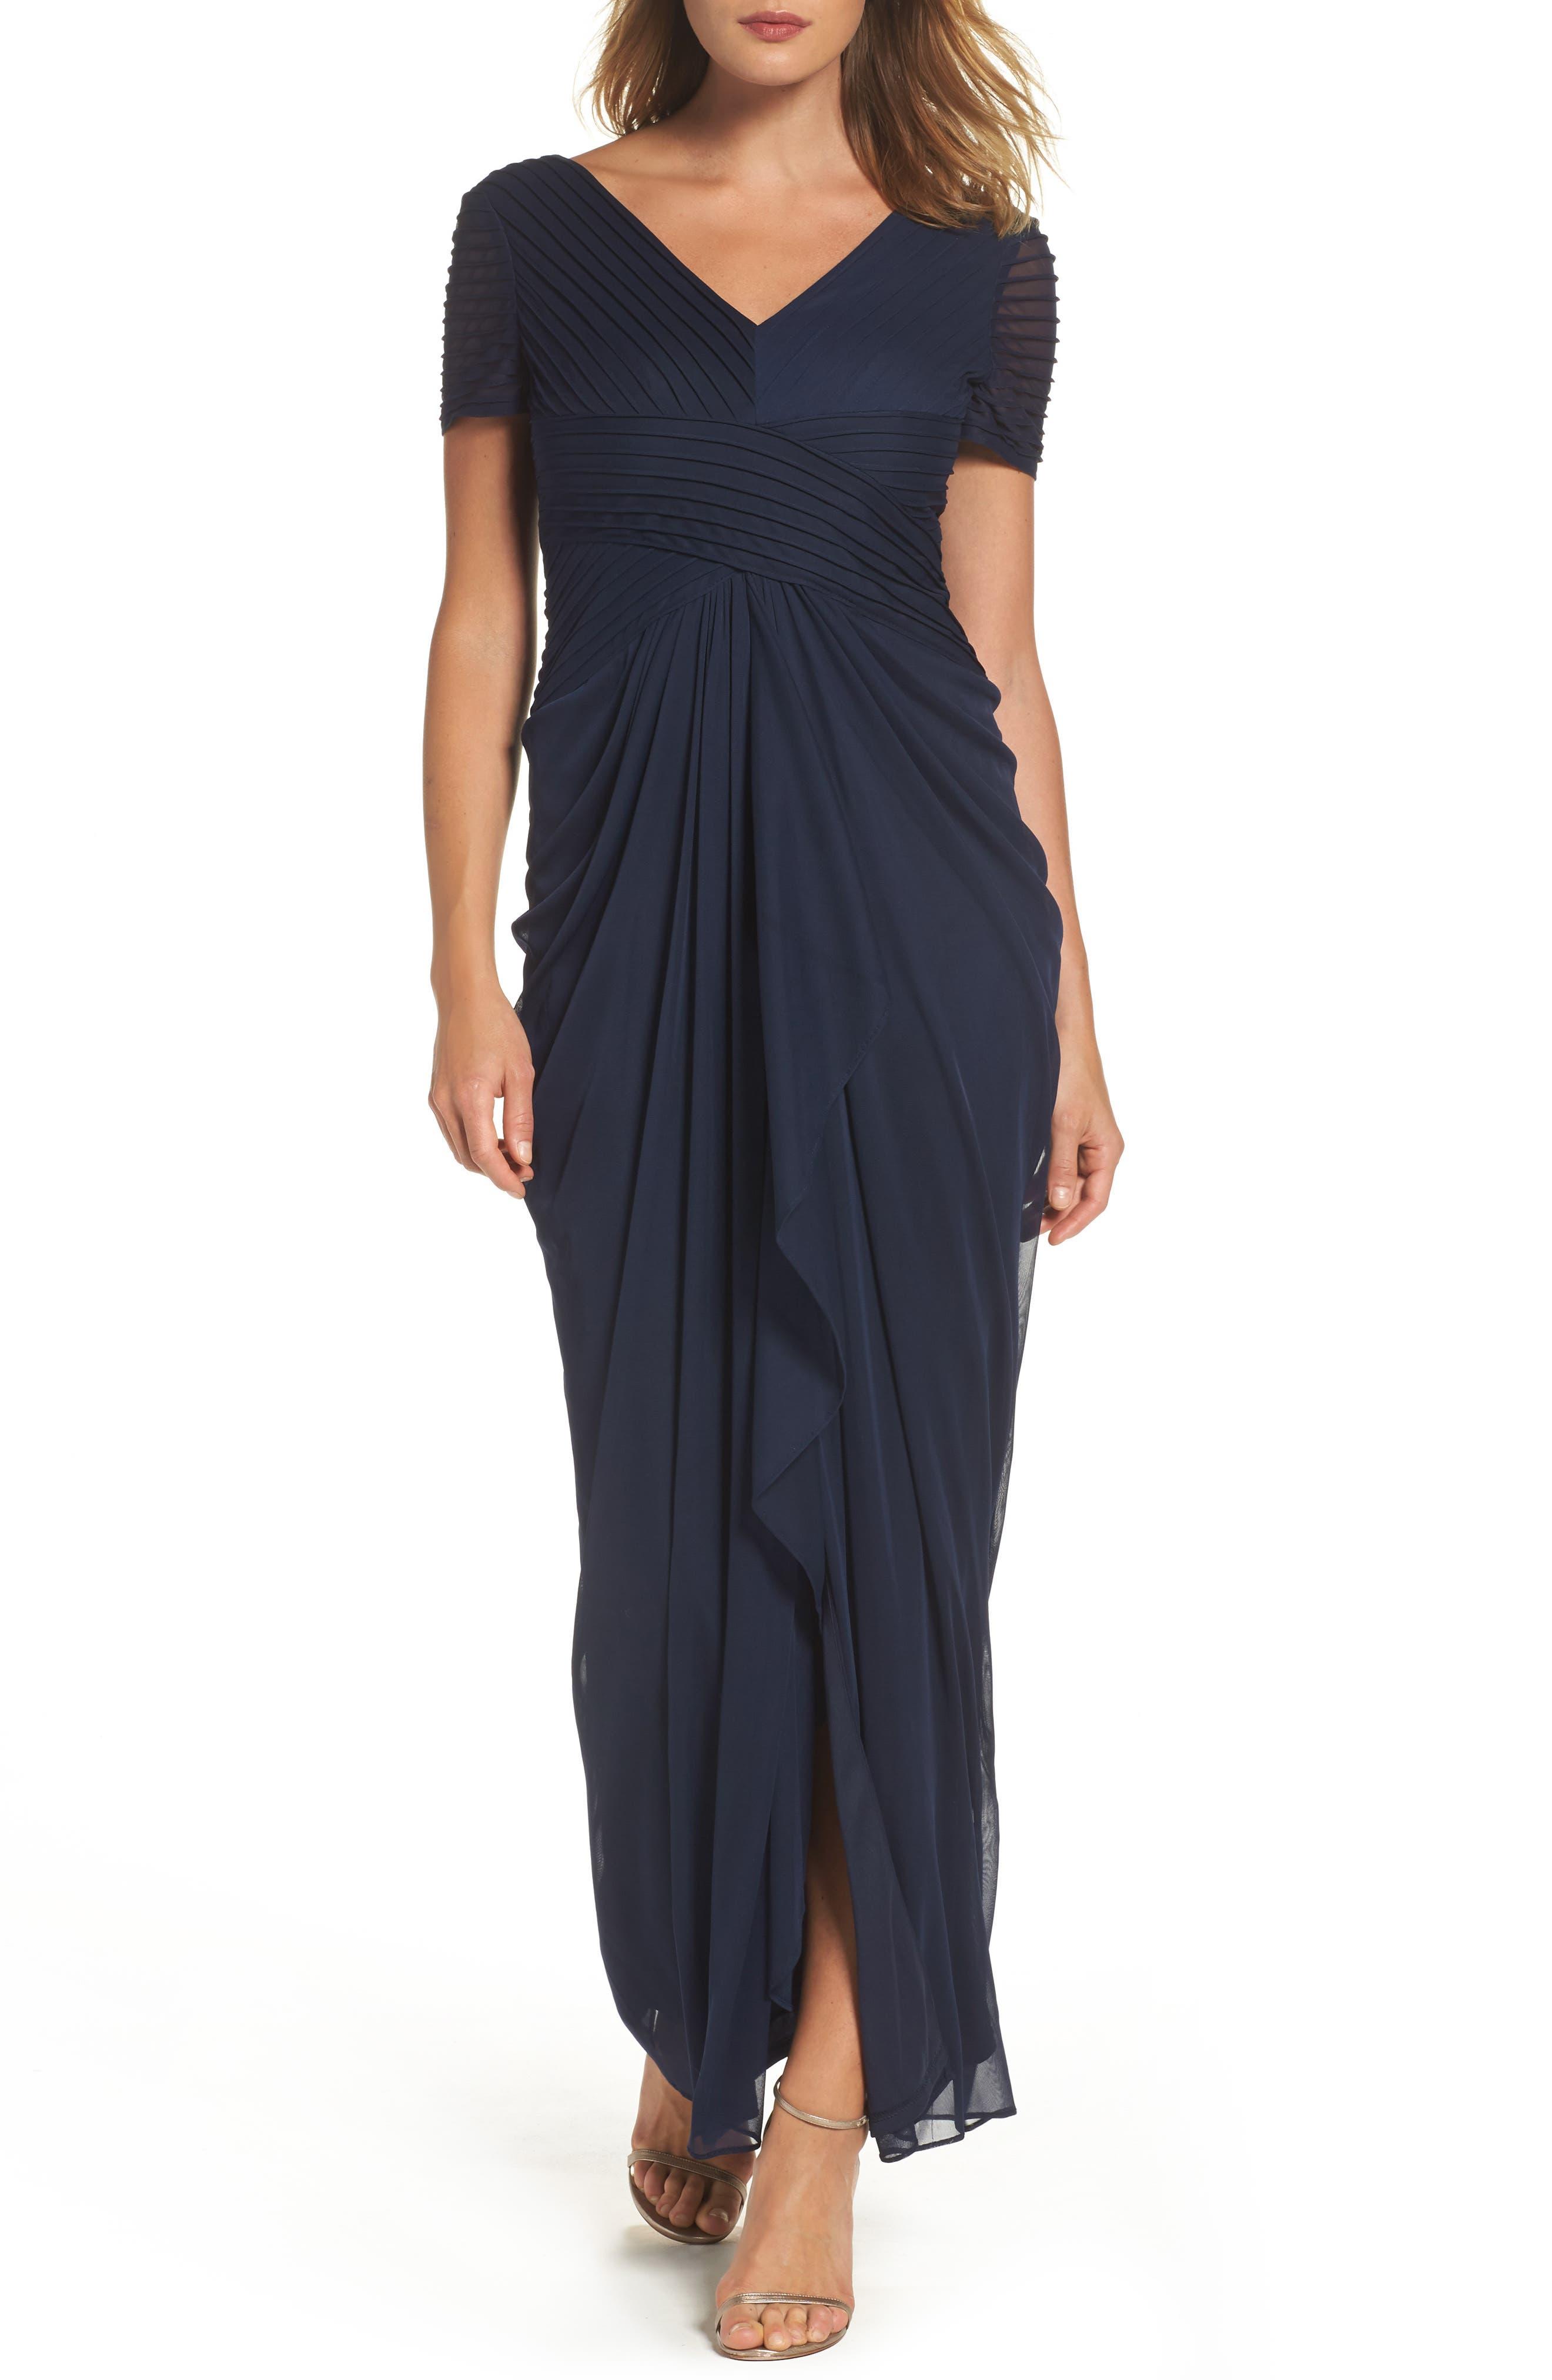 Alternate Image 1 Selected - Adrianna Papell Draped Mesh Gown (Regular & Petite)